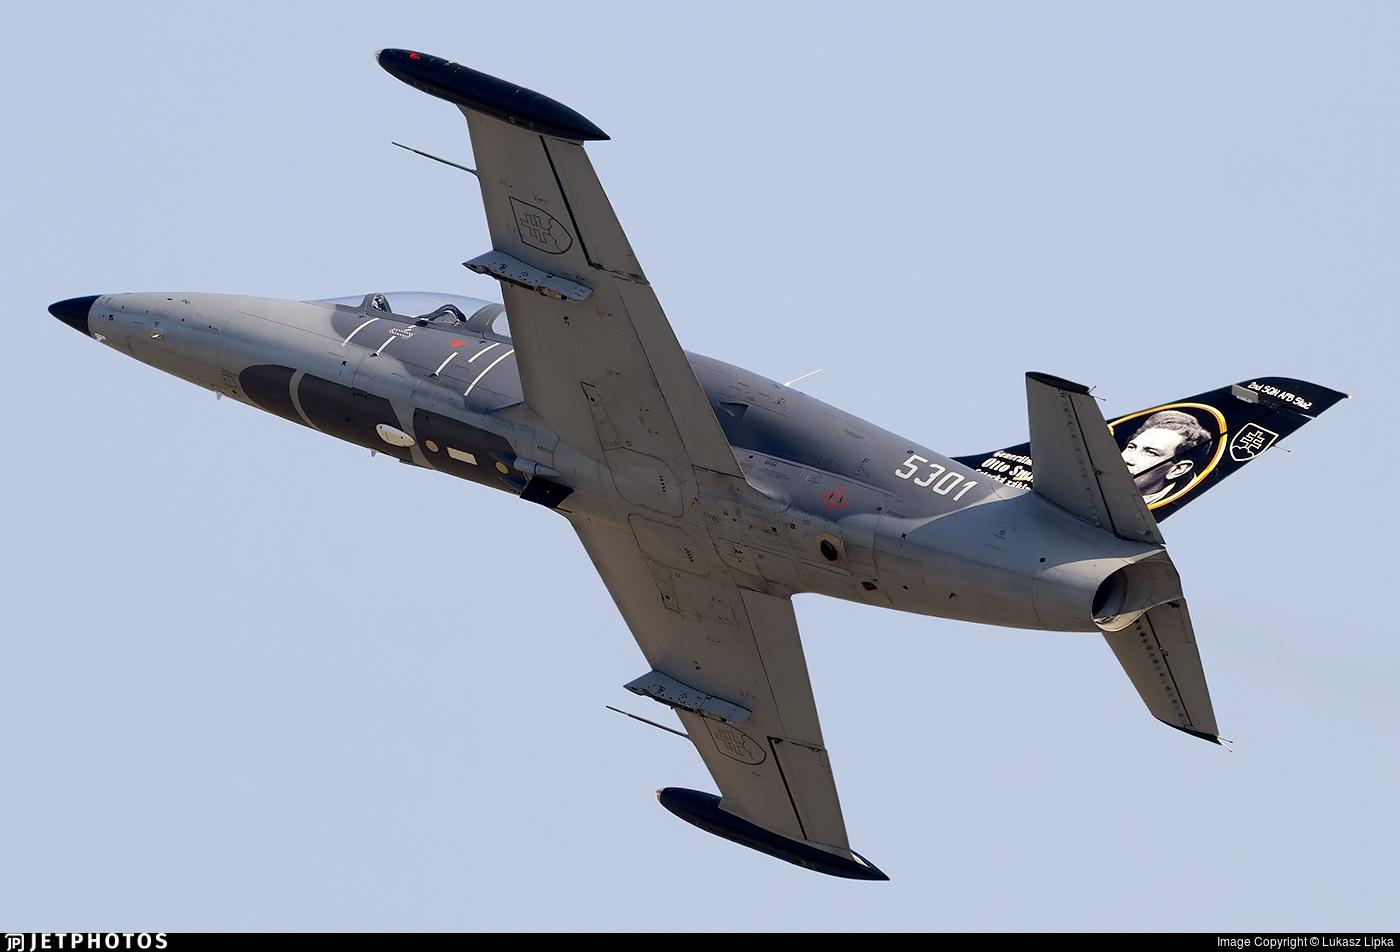 5301 - Aero L-39CM Albatros - Slovakia - Air Force